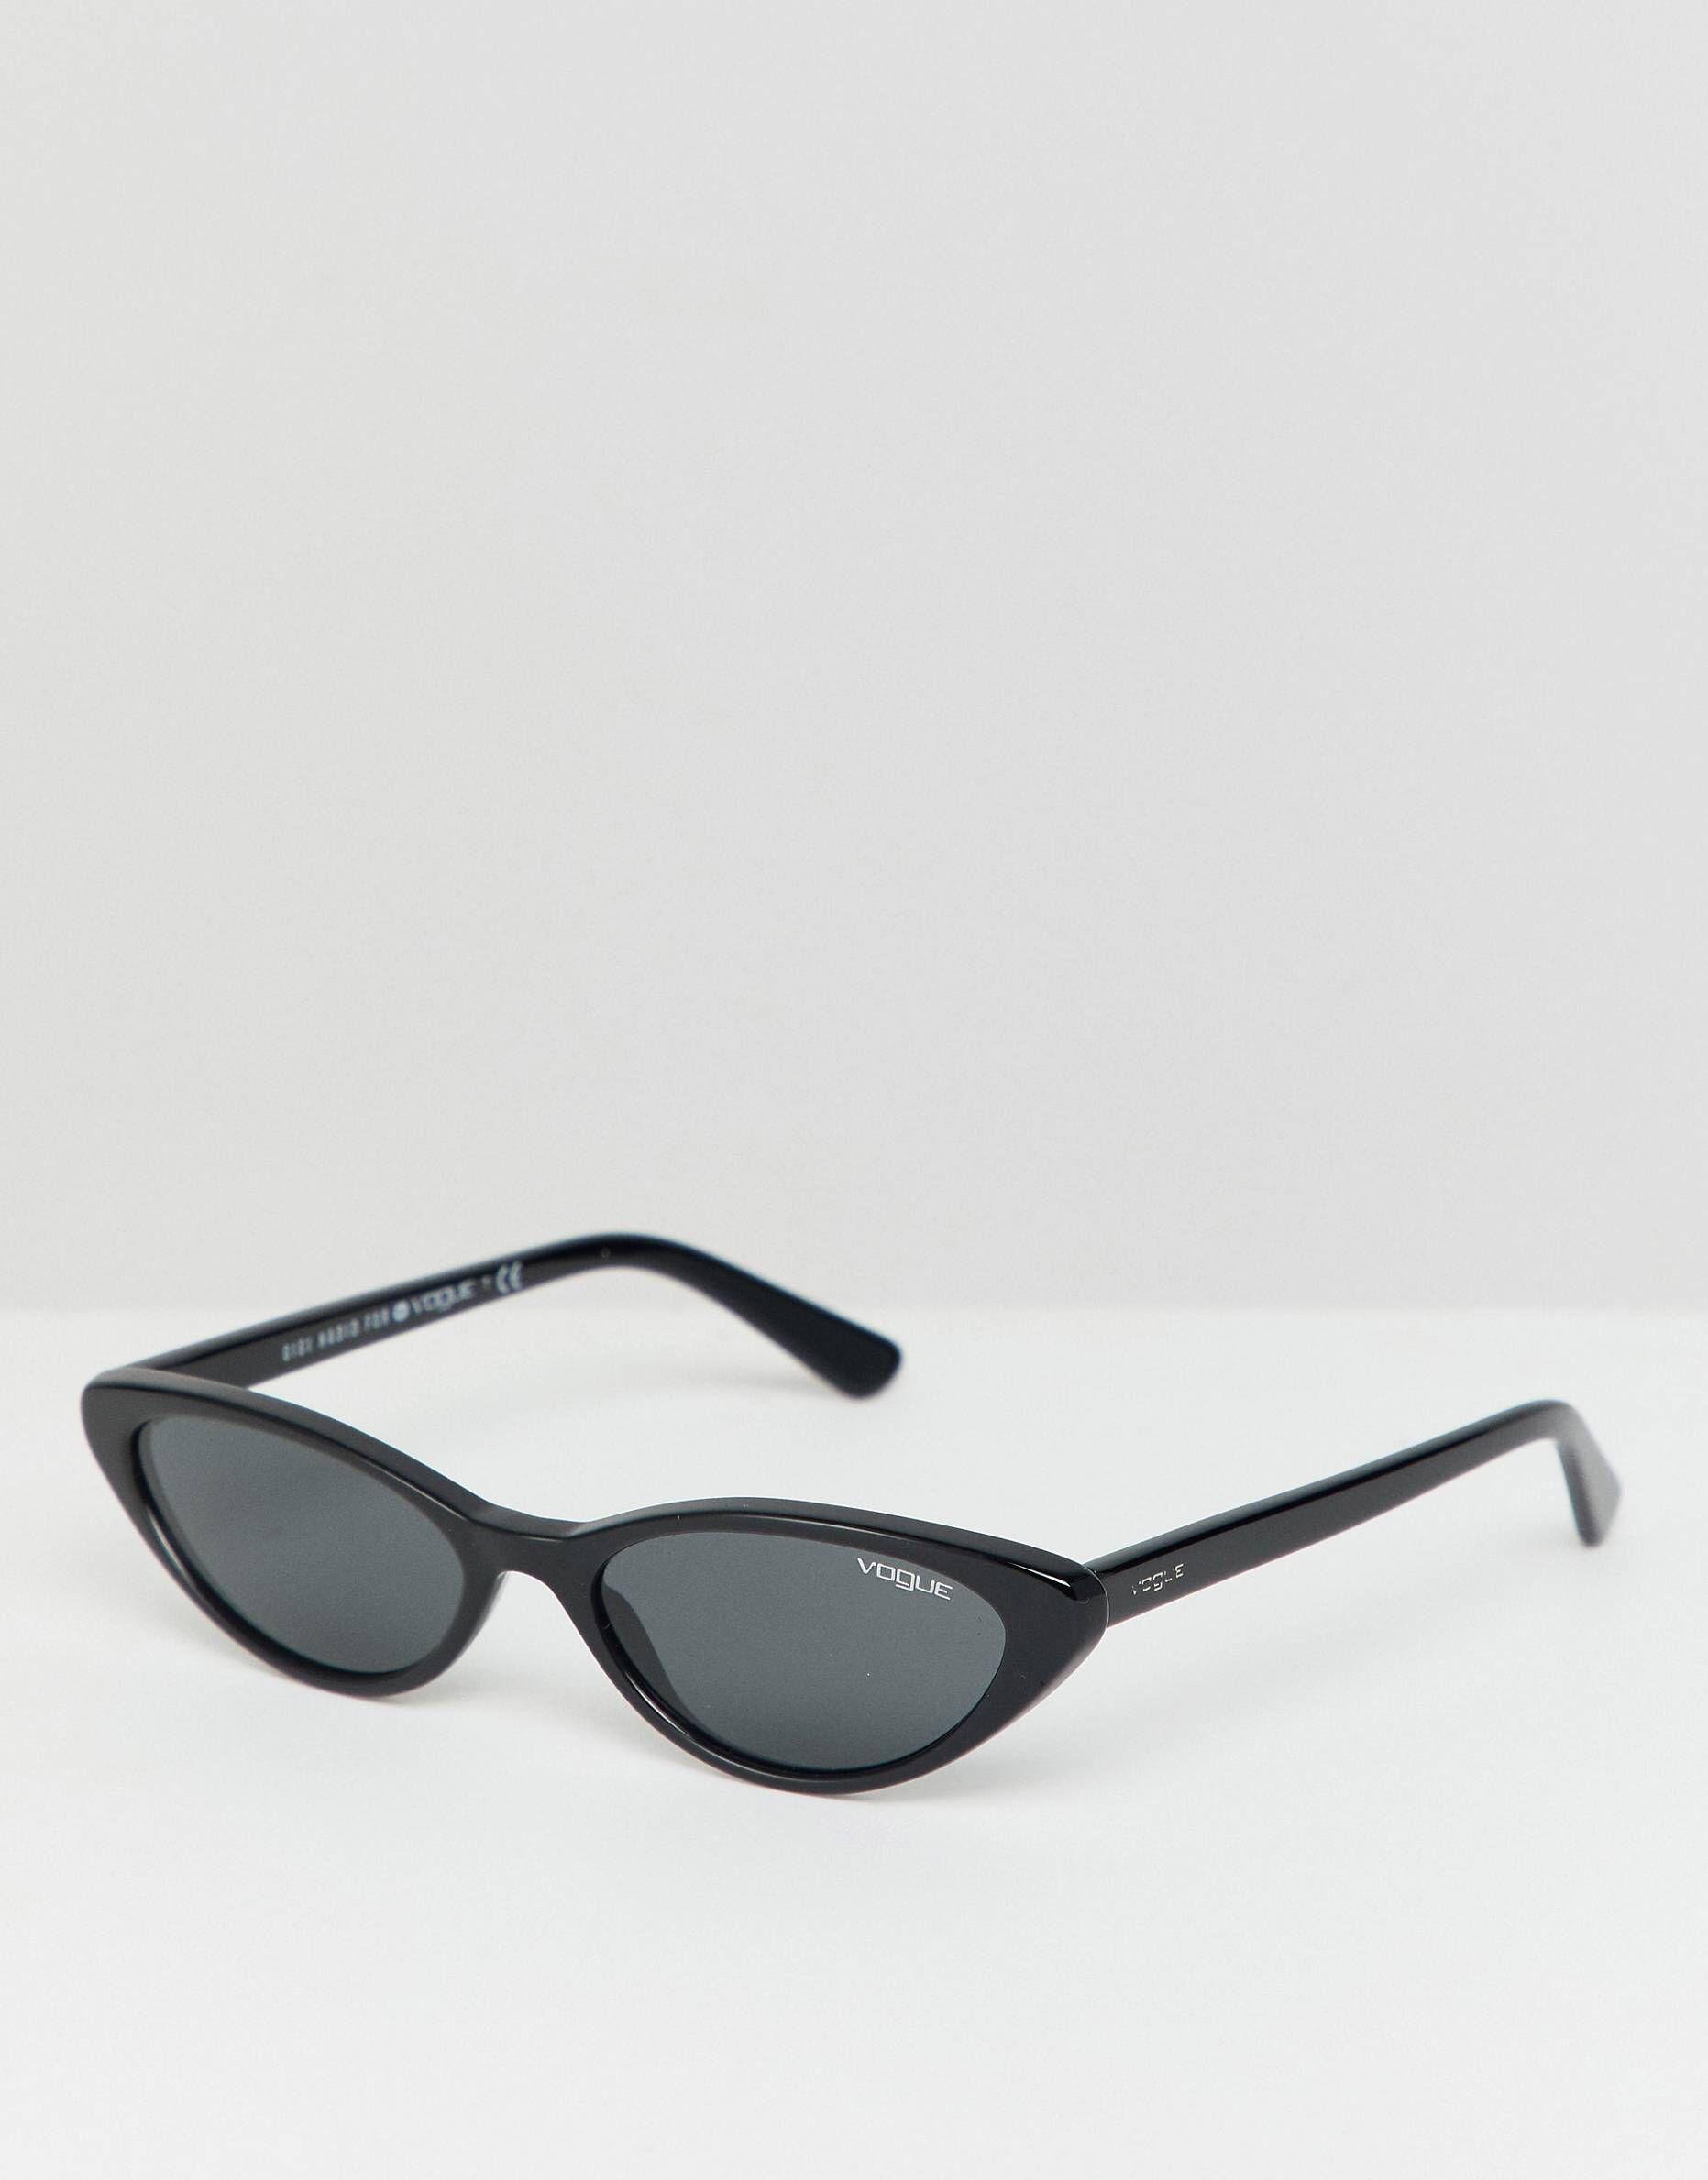 69b9782b99338 Vogue Eyewear 0VO5237S cat eye slim frame sunglasses in black by Gigi Hadid